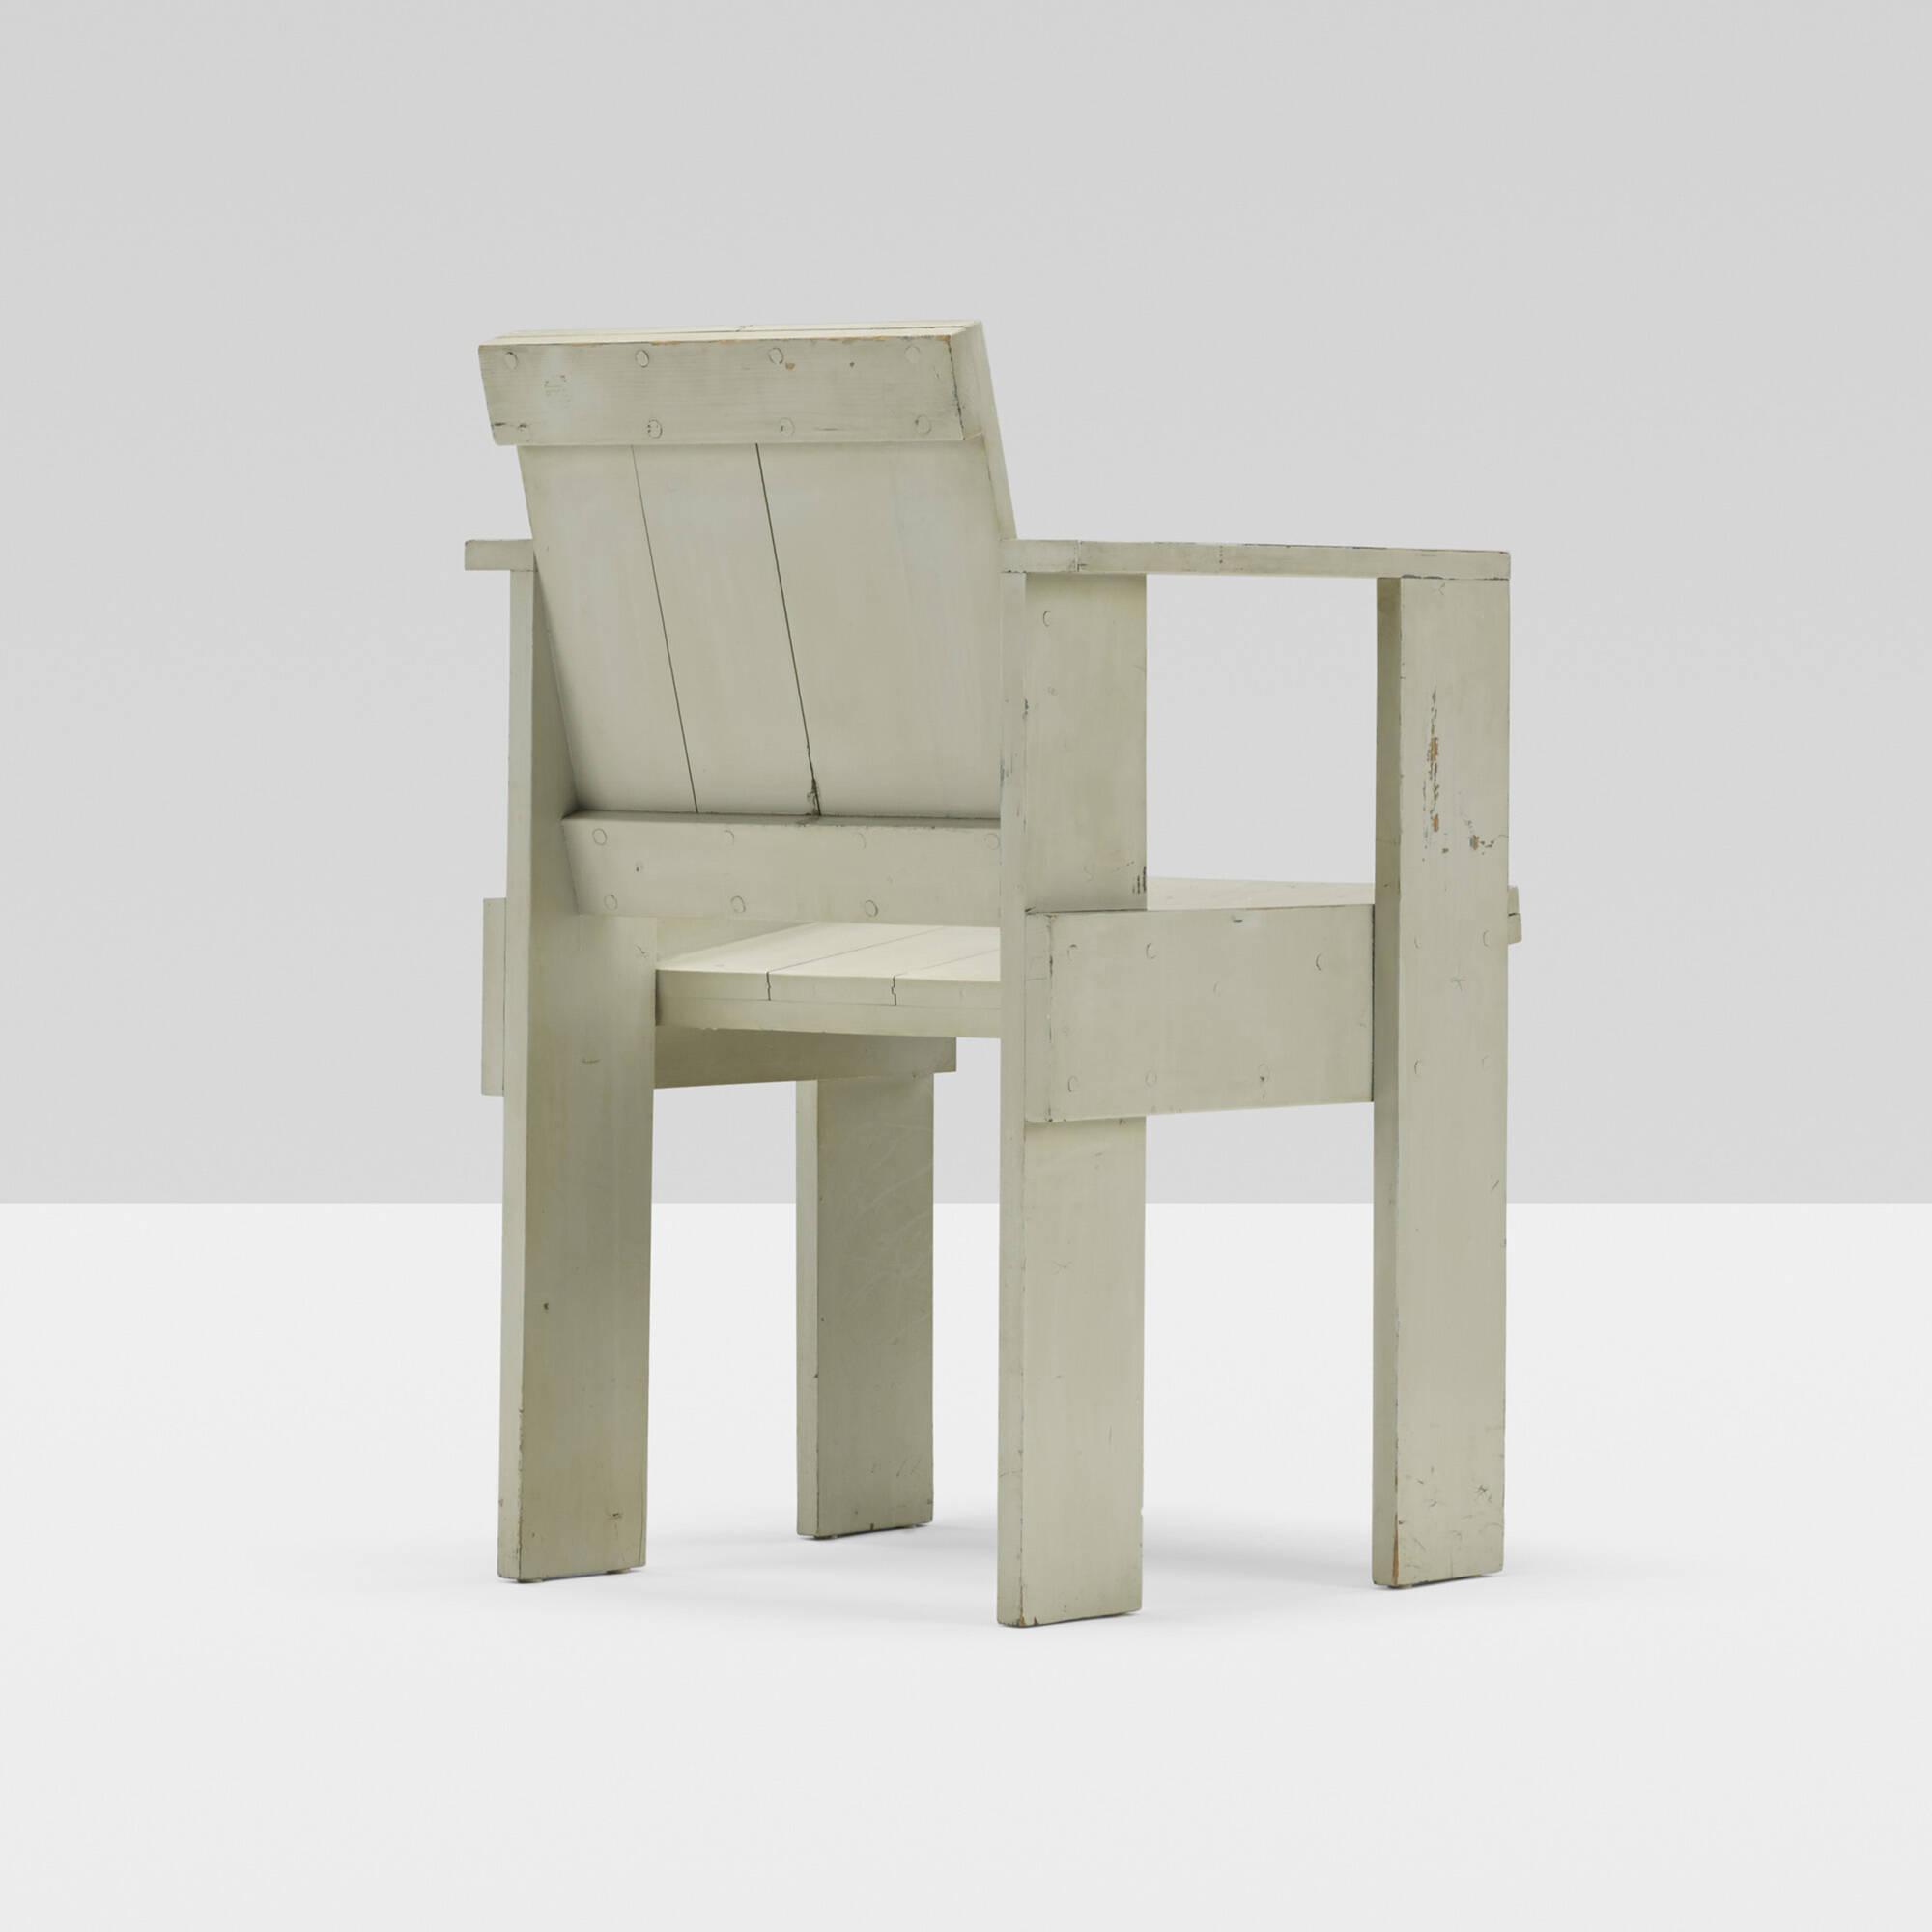 Miraculous 159 Gerrit Rietveld Crate Chair Design 12 December 2013 Download Free Architecture Designs Scobabritishbridgeorg